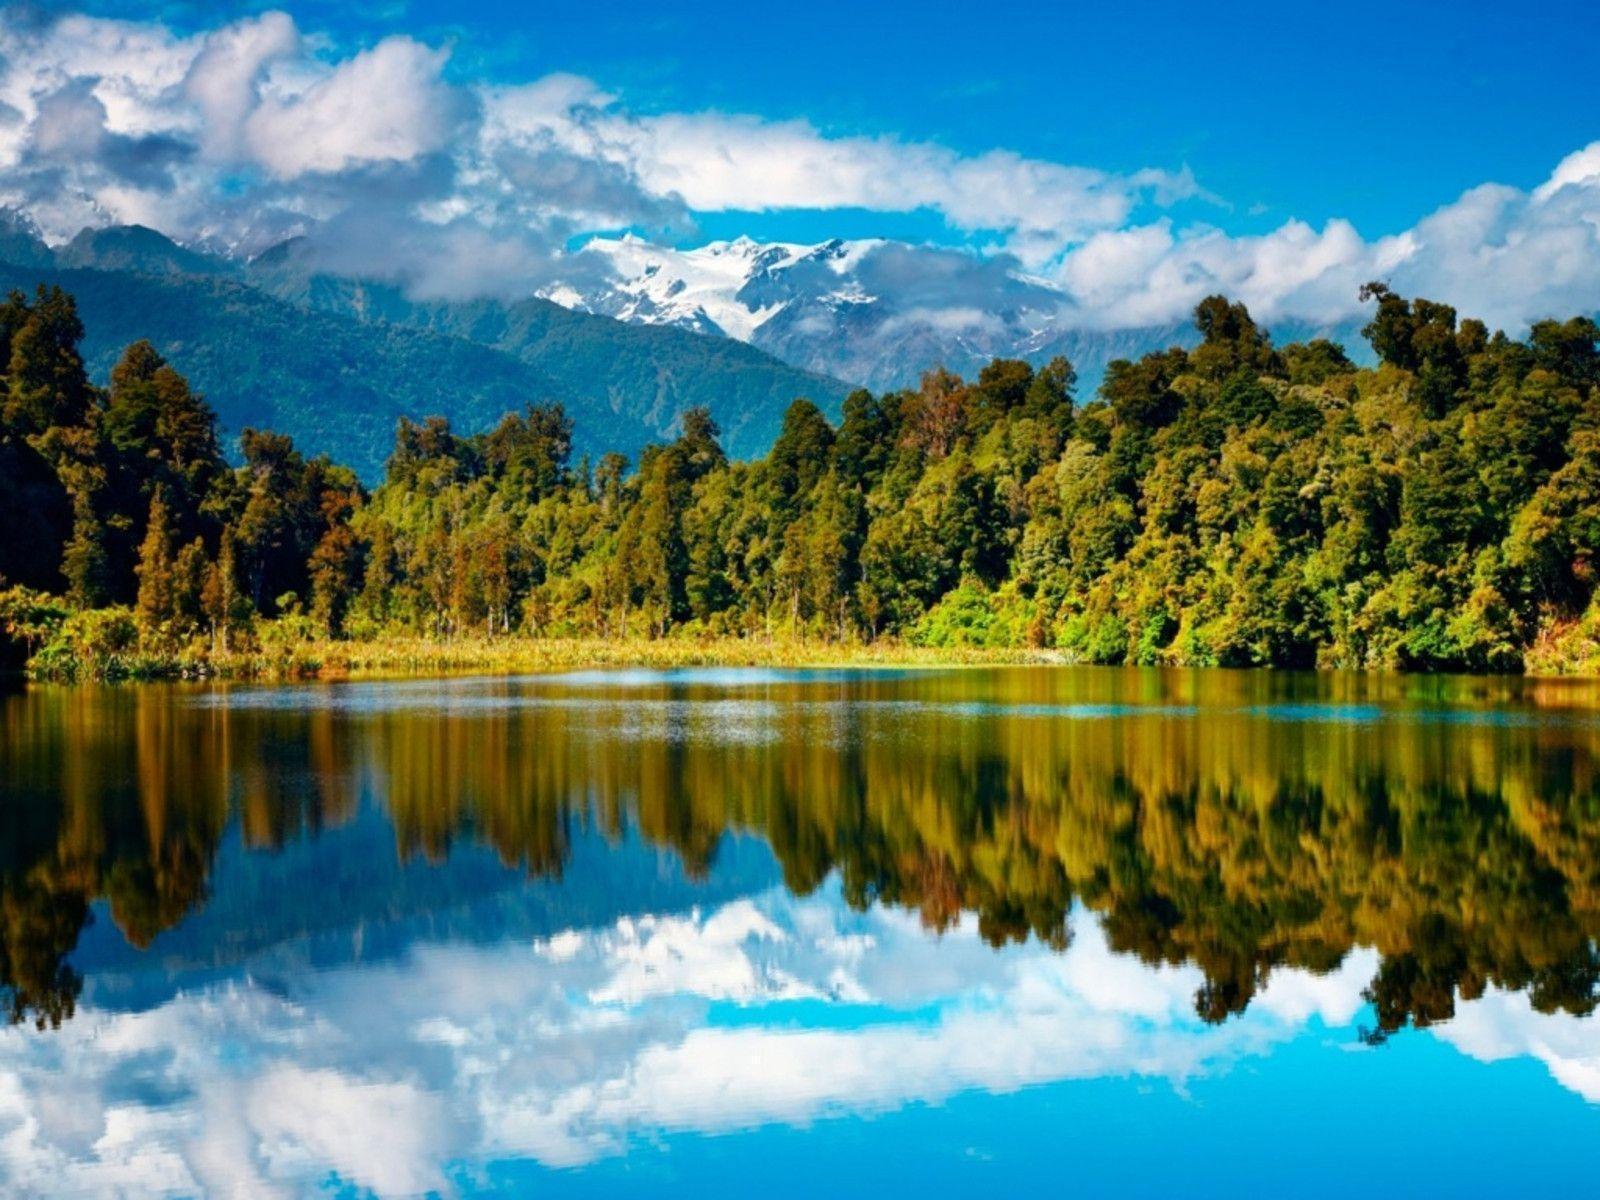 Wallpaper download nature beauty - Beautiful Nature Wallpaper For Desktop Hd Background 9 Hd